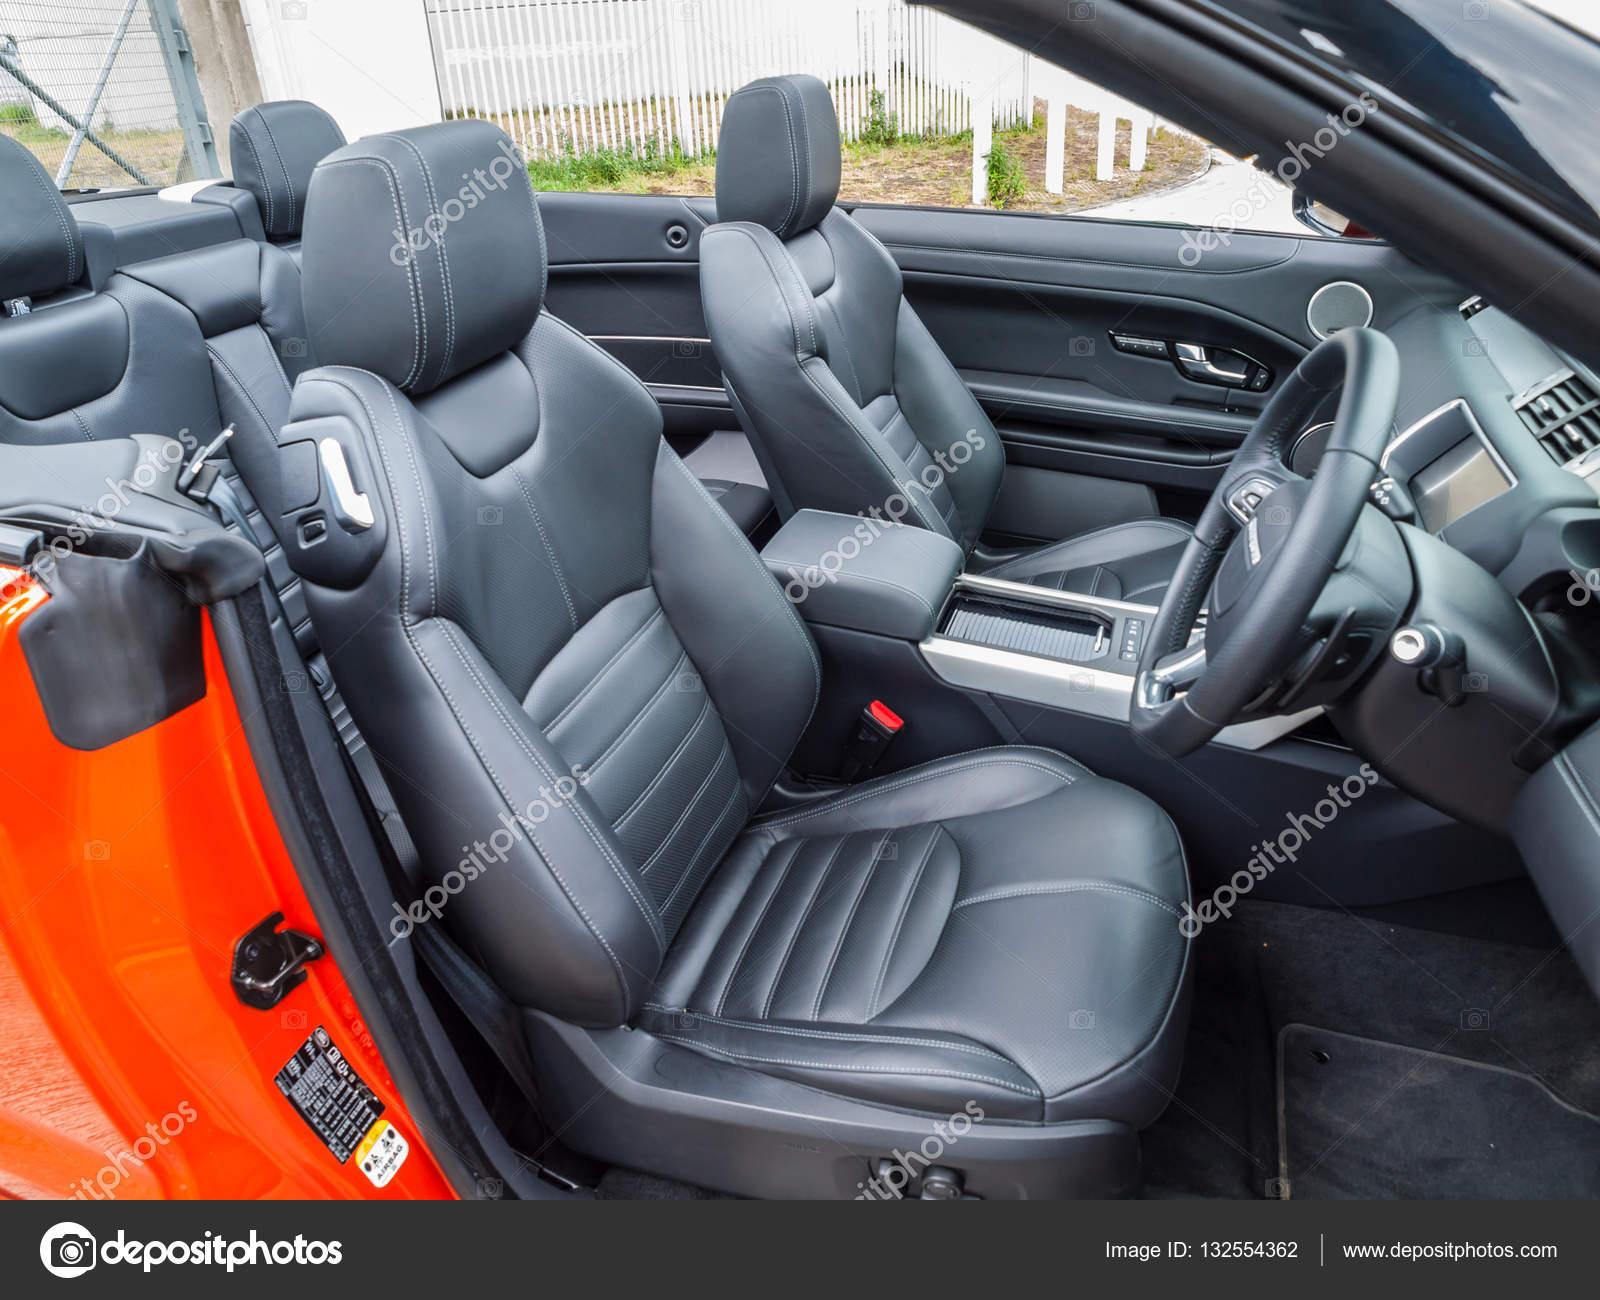 https://st3.depositphotos.com/6664102/13255/i/1600/depositphotos_132554362-stock-photo-range-rover-evoque-convertible-interior.jpg